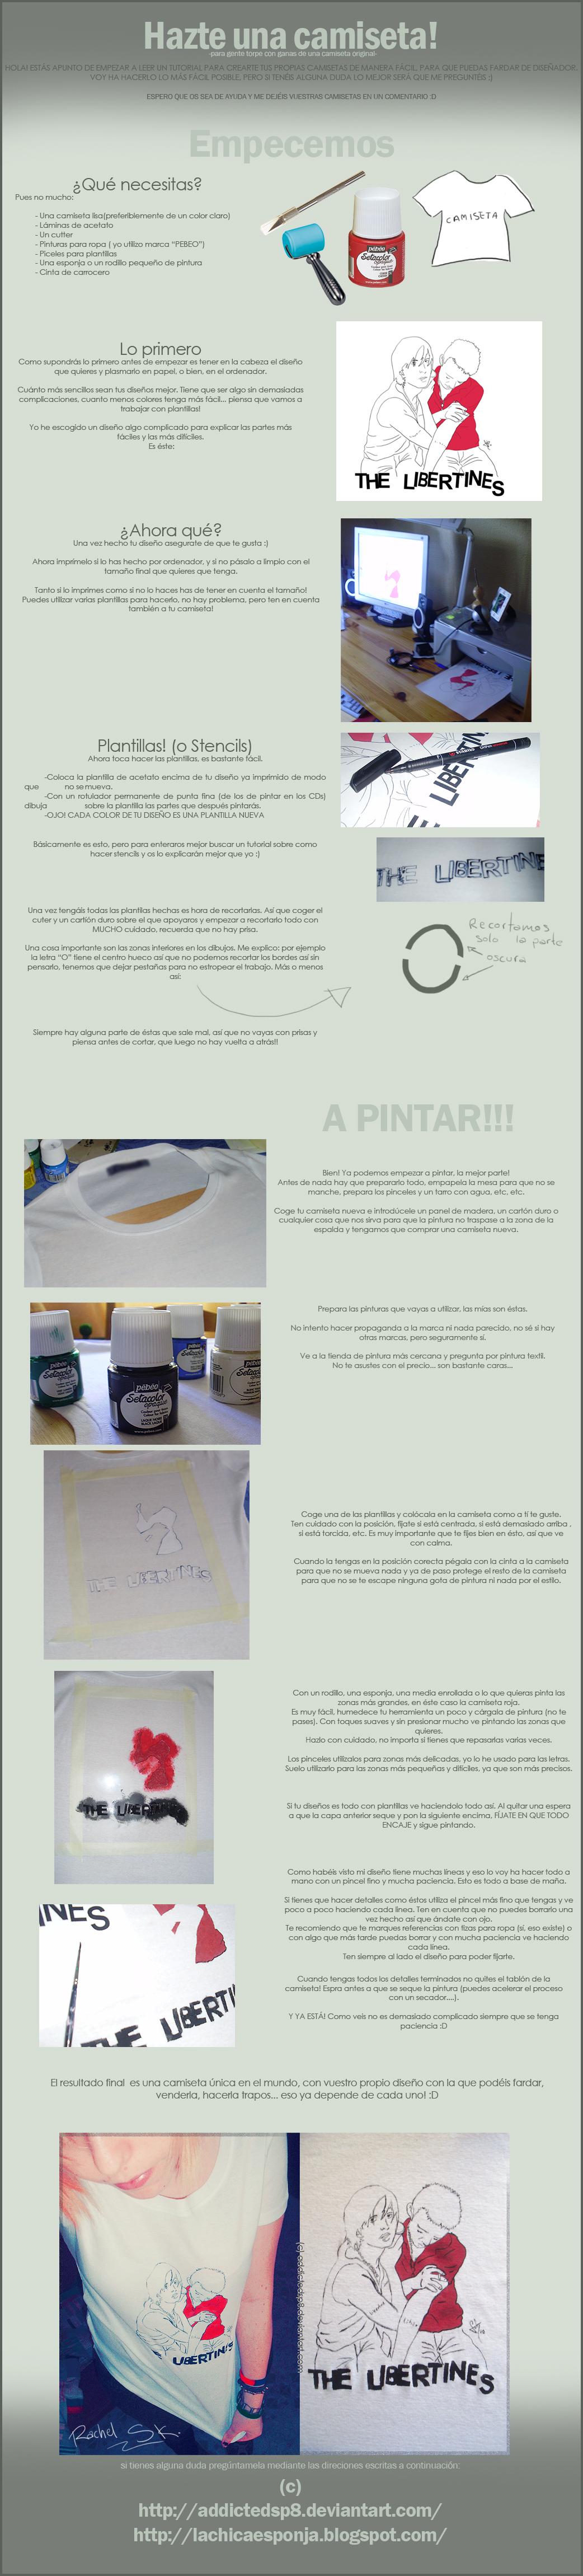 TUTORIAL: pintando camisetas by addictedsp8